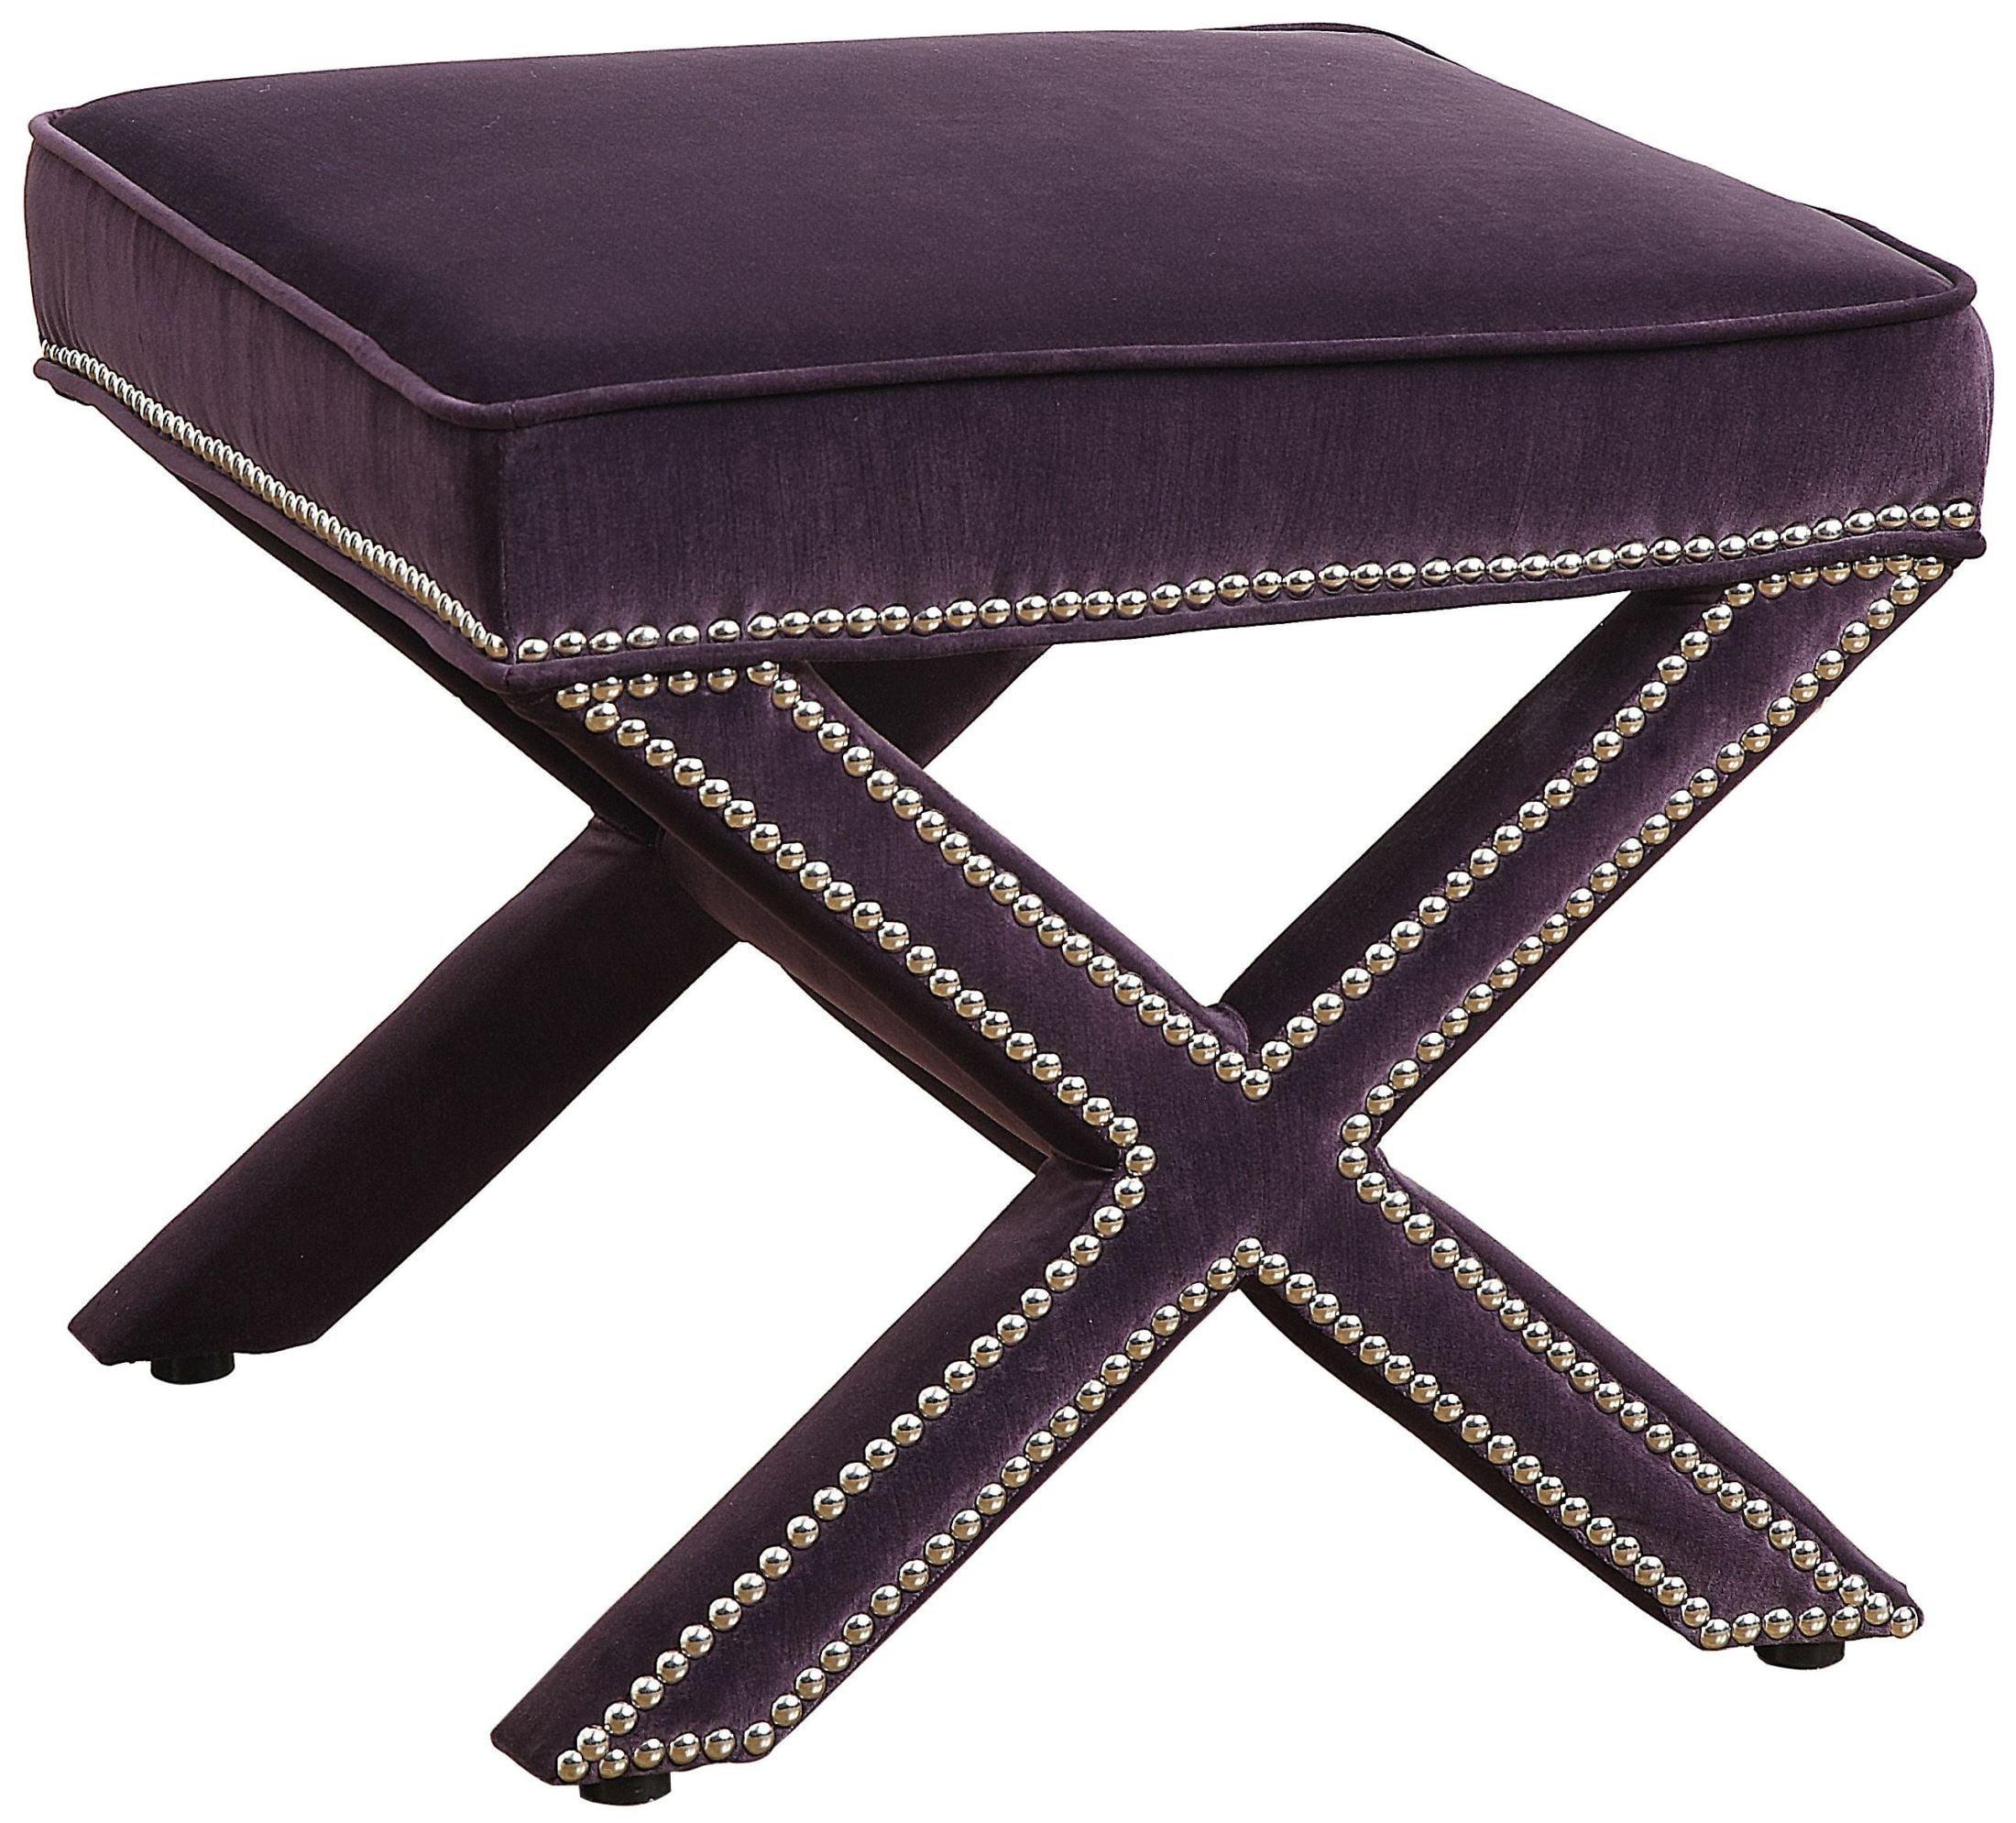 Reese Purple Velvet Ottoman From Tov Tov O17 Purple